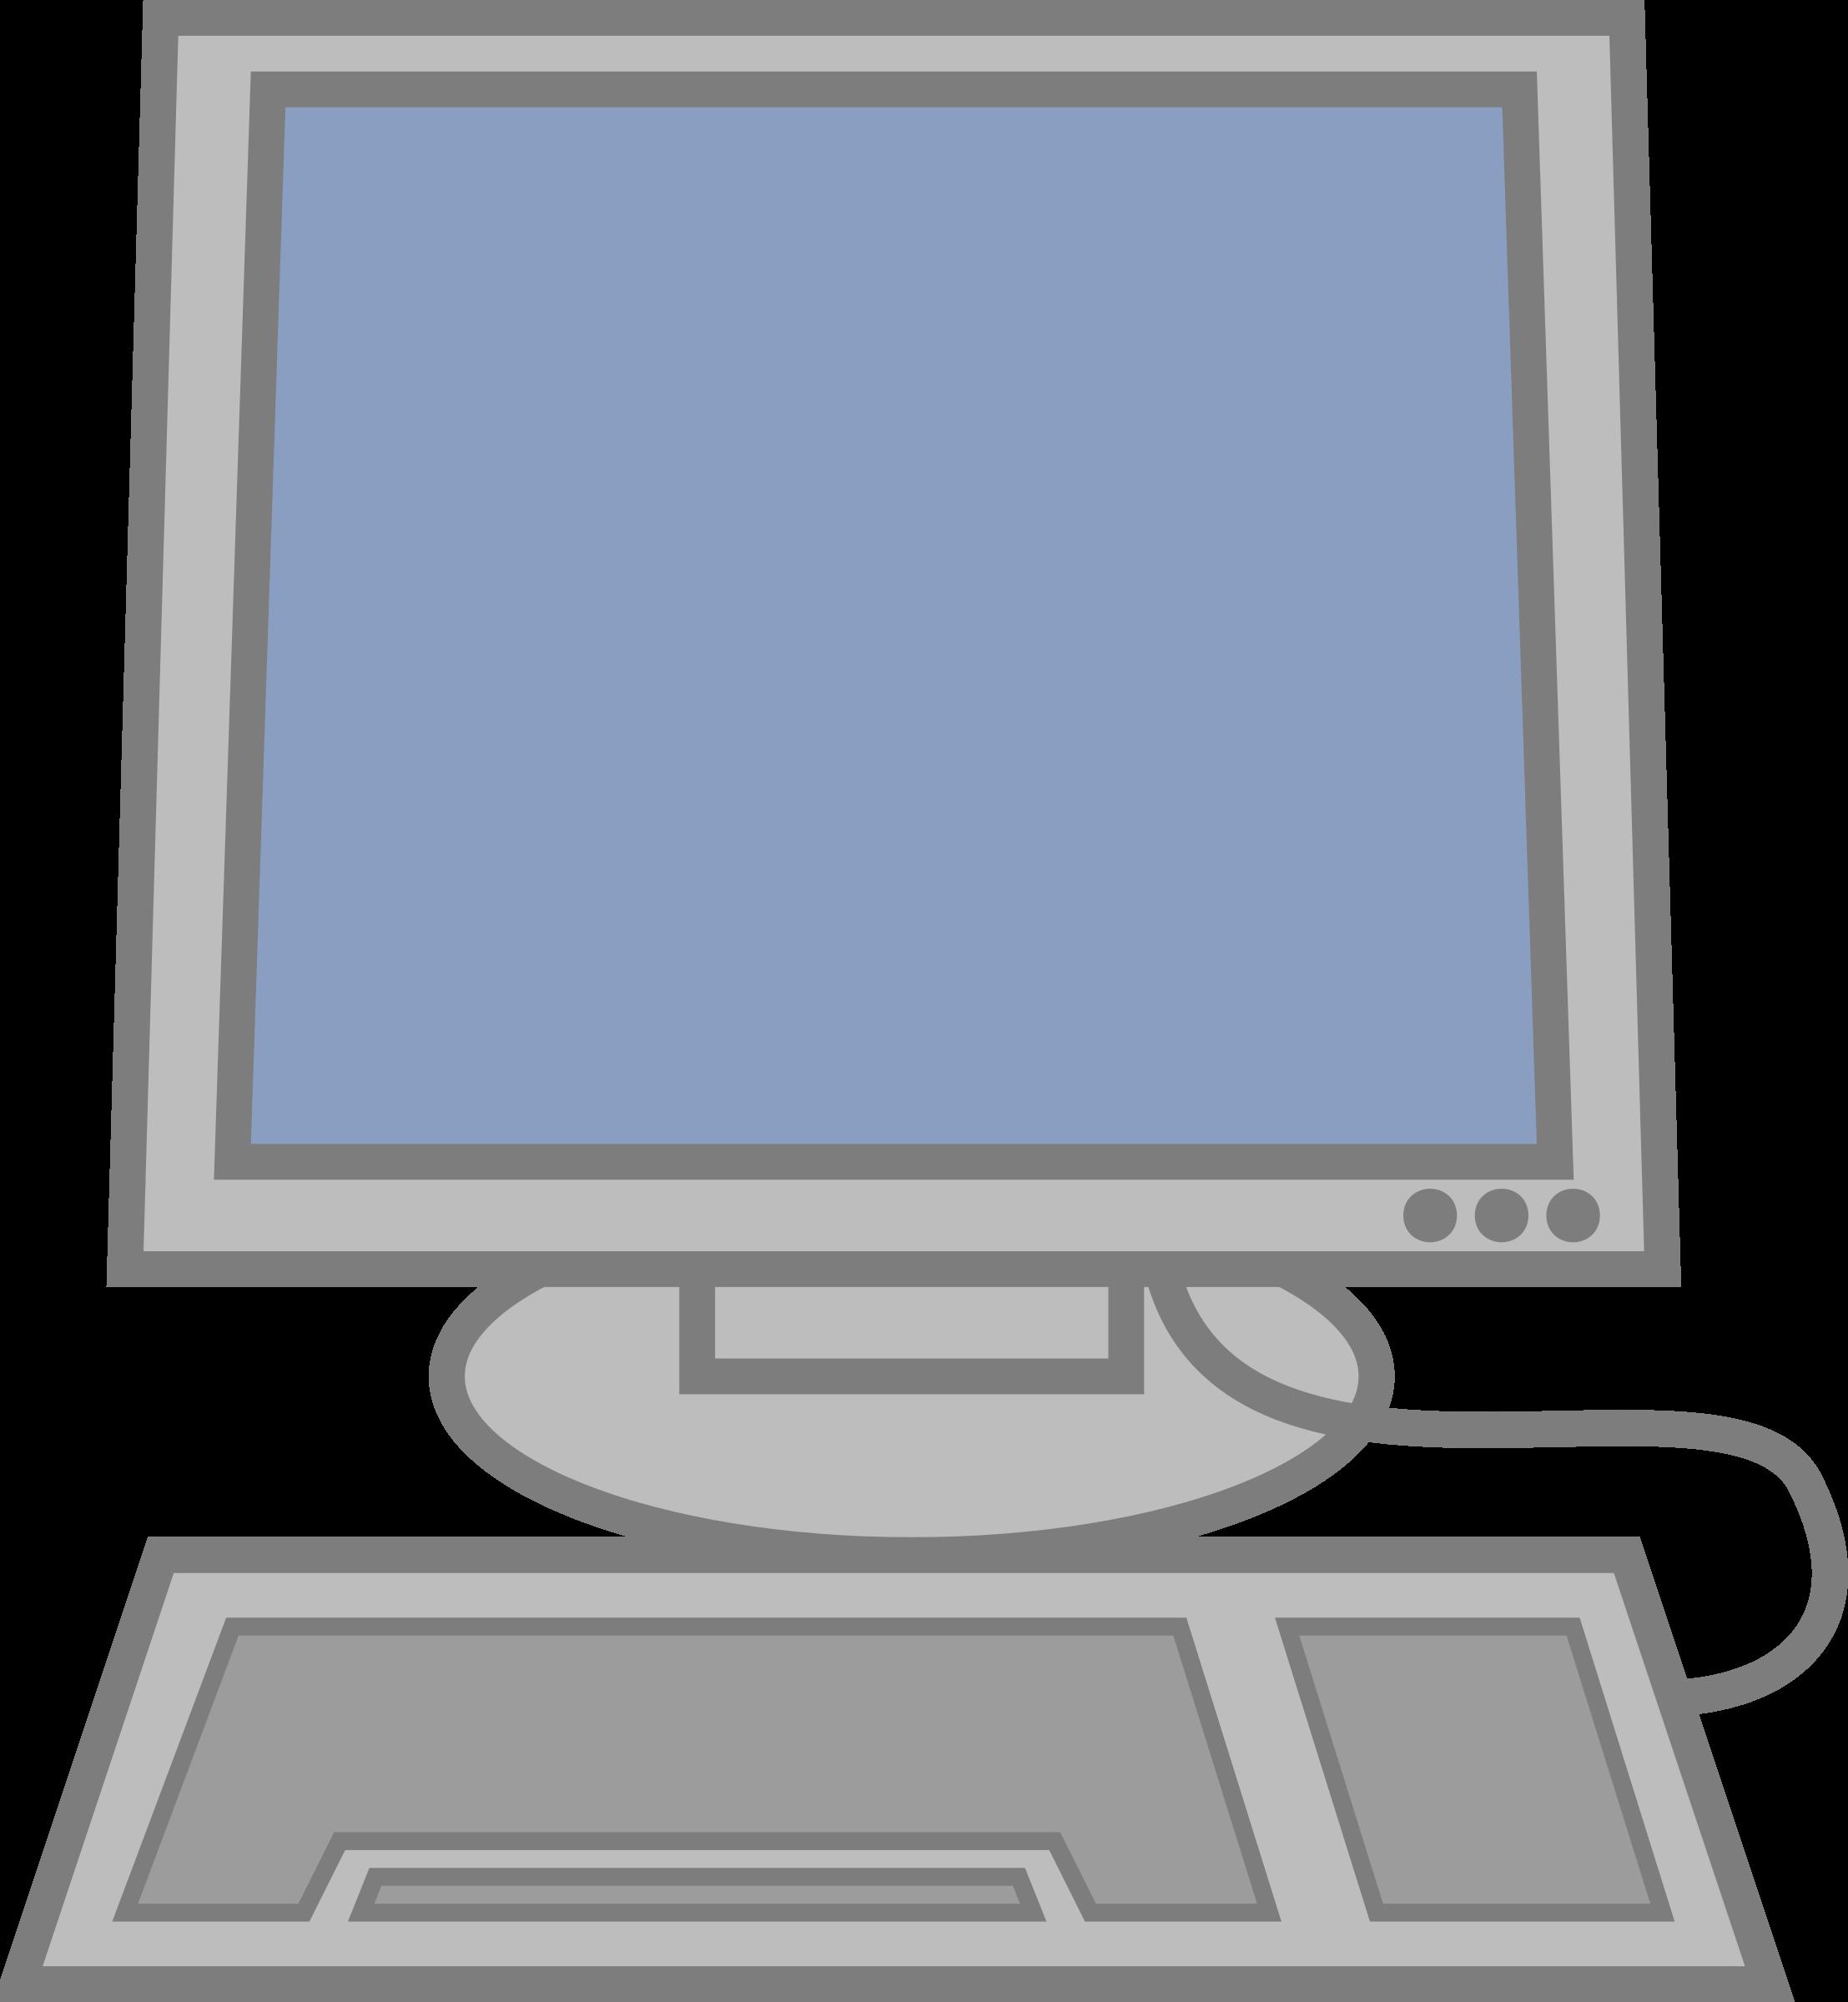 Computer Clipart Puter-Computer clipart puter-13